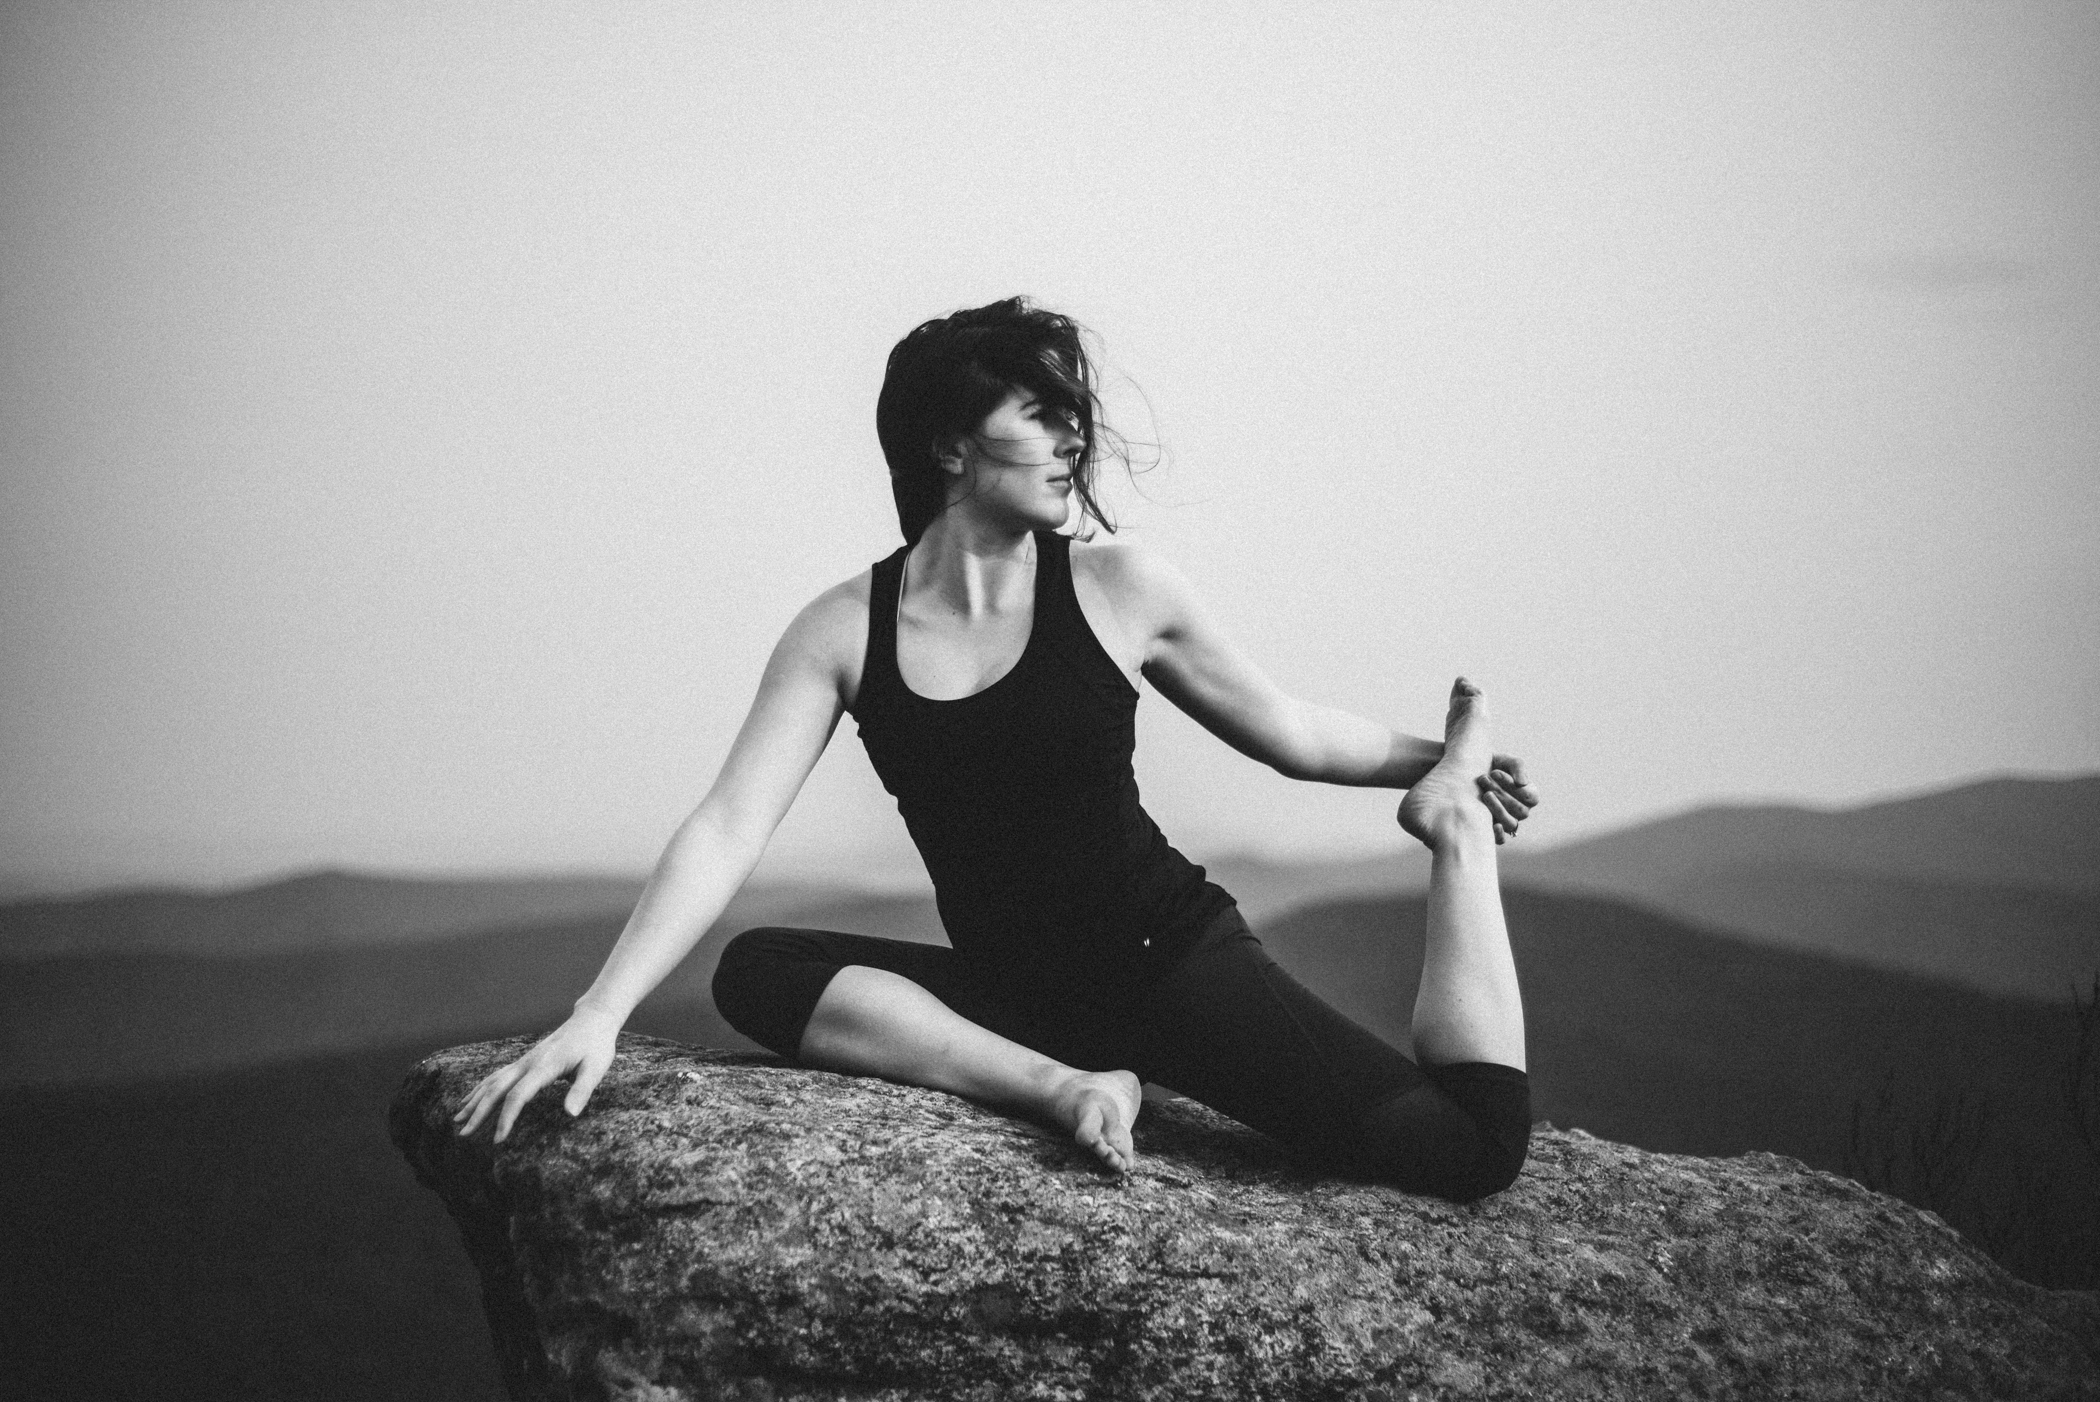 Yoga Mountain Top Yoga Portraits at Shenandoah National Park_3.JPG